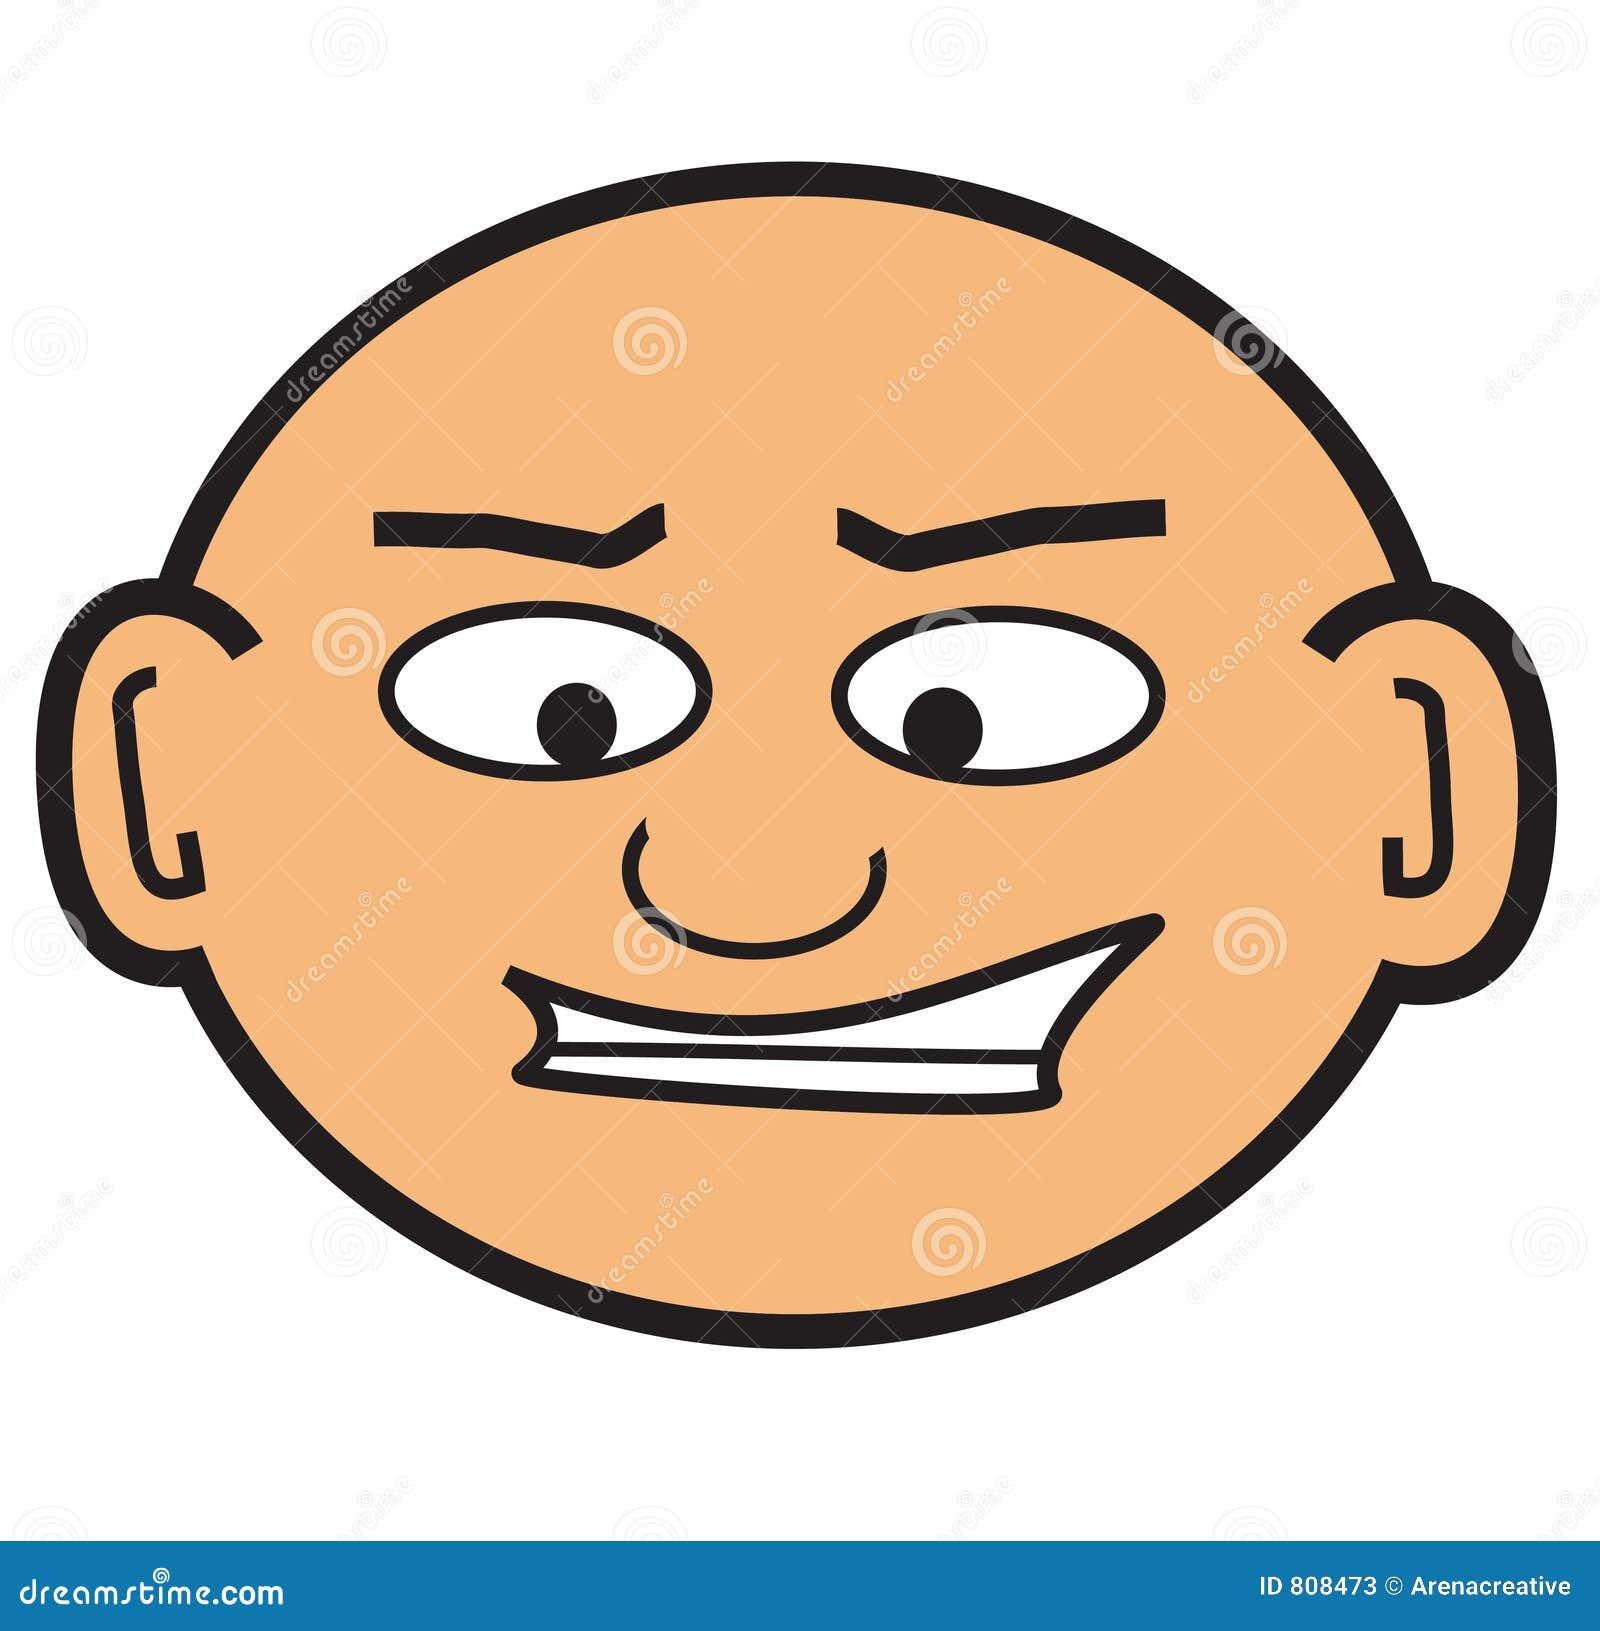 Cartoon Bald Head Stock Photos - Image: 808473